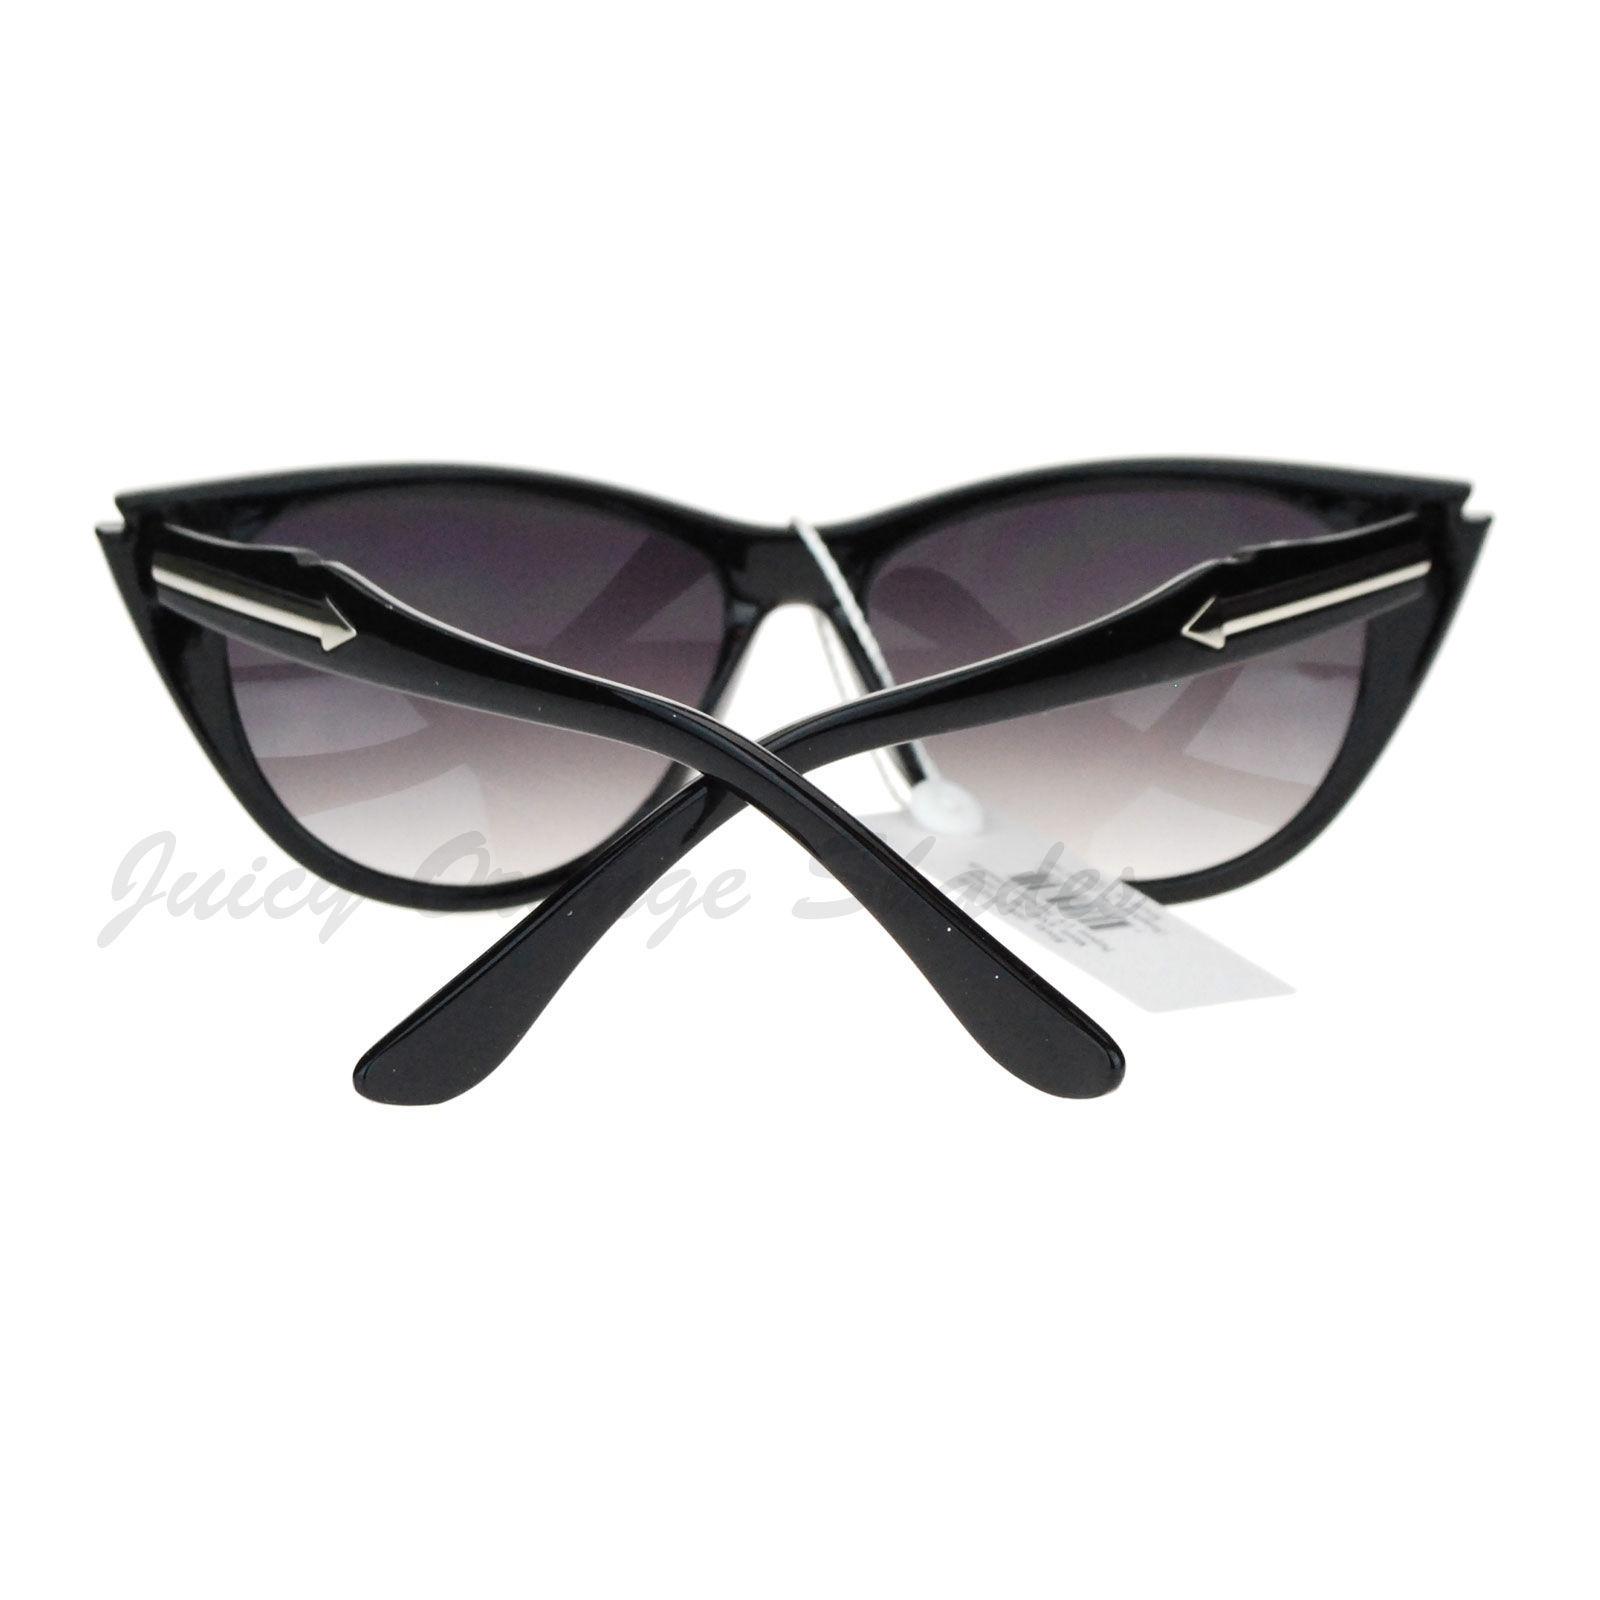 Arrow Design Womens Vintage Retro Fashion Cateye Sunglasses